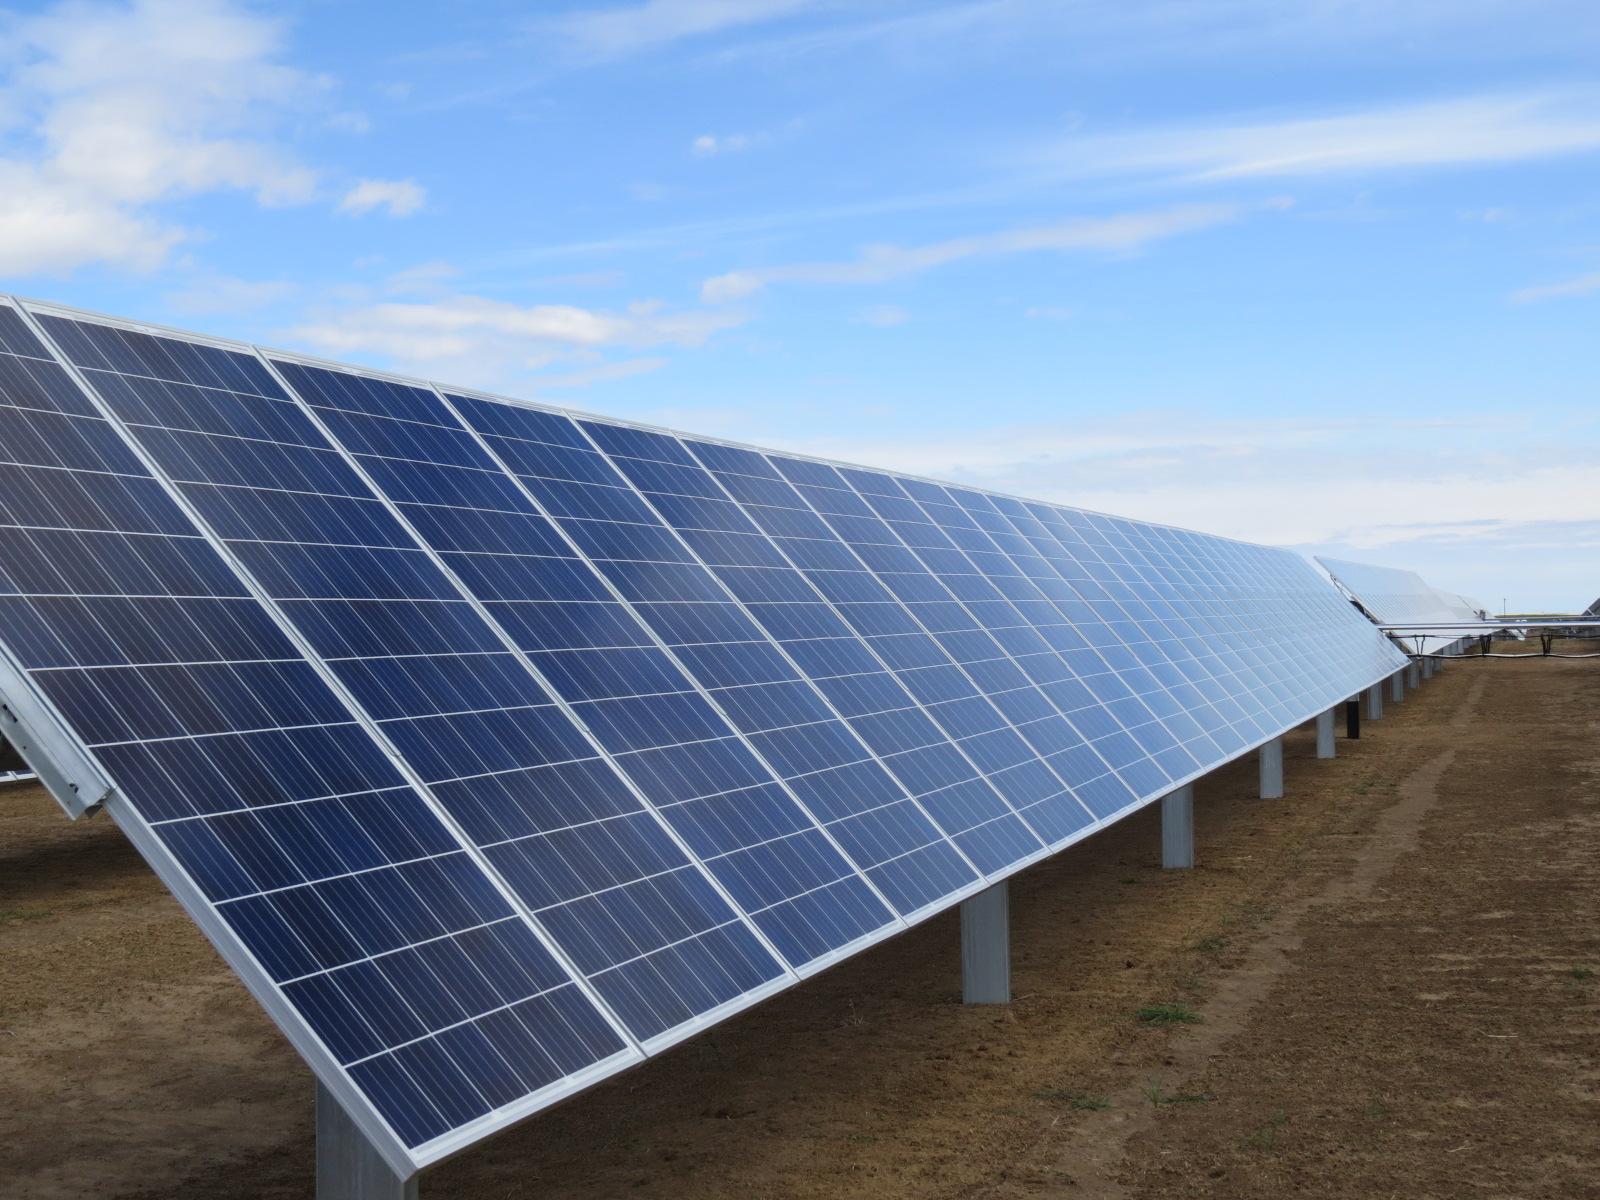 Victory Solar panels pic 11.JPG